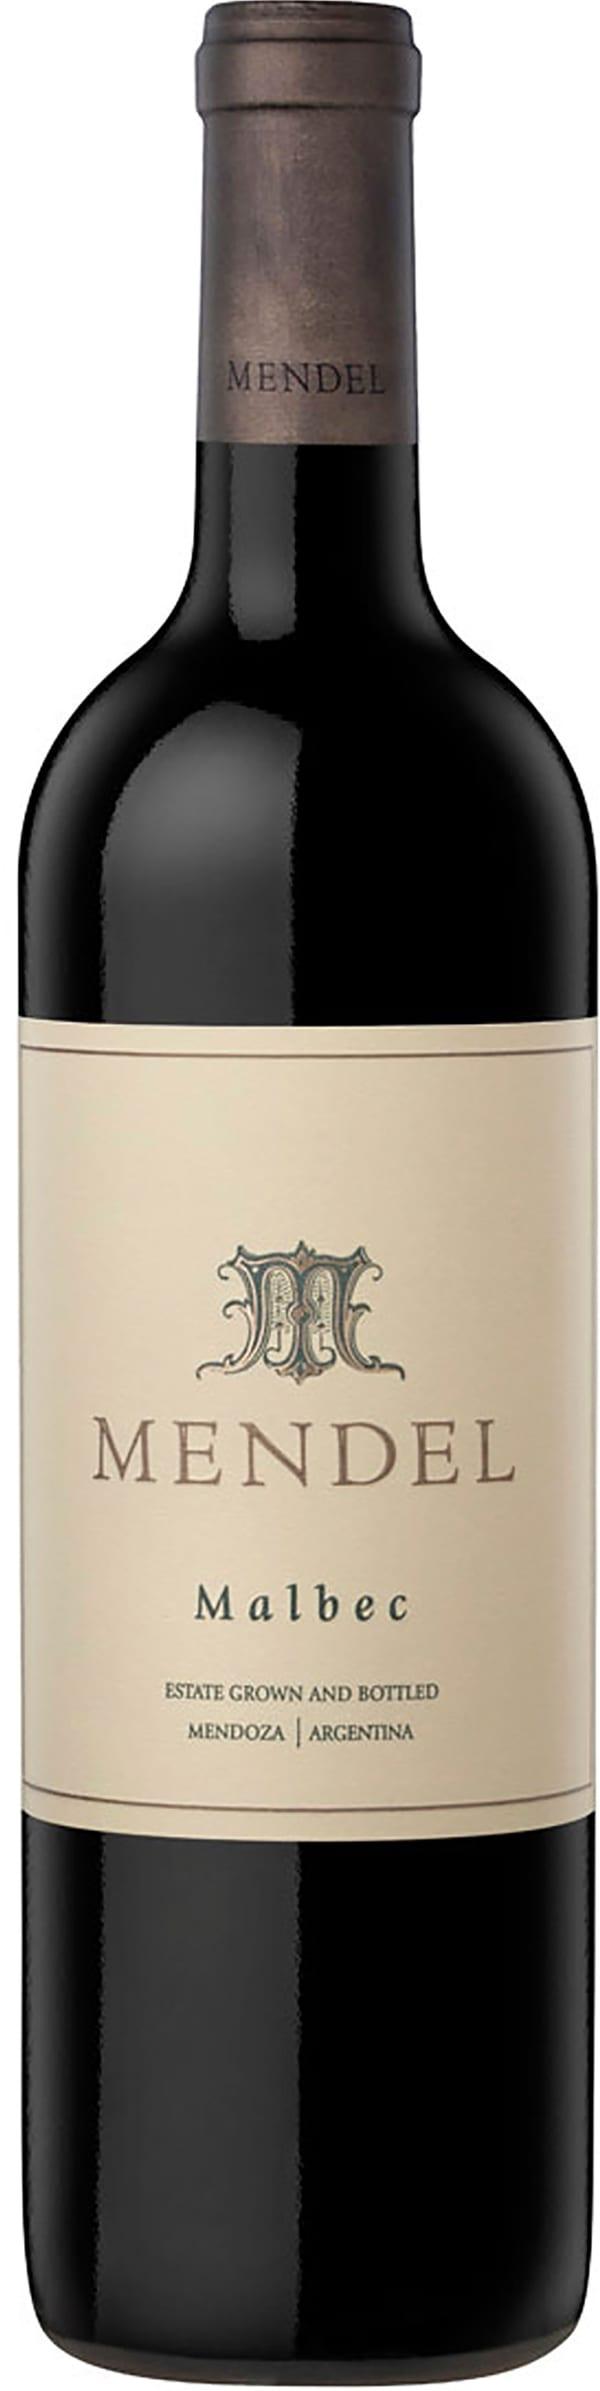 Mendel Malbec 2018